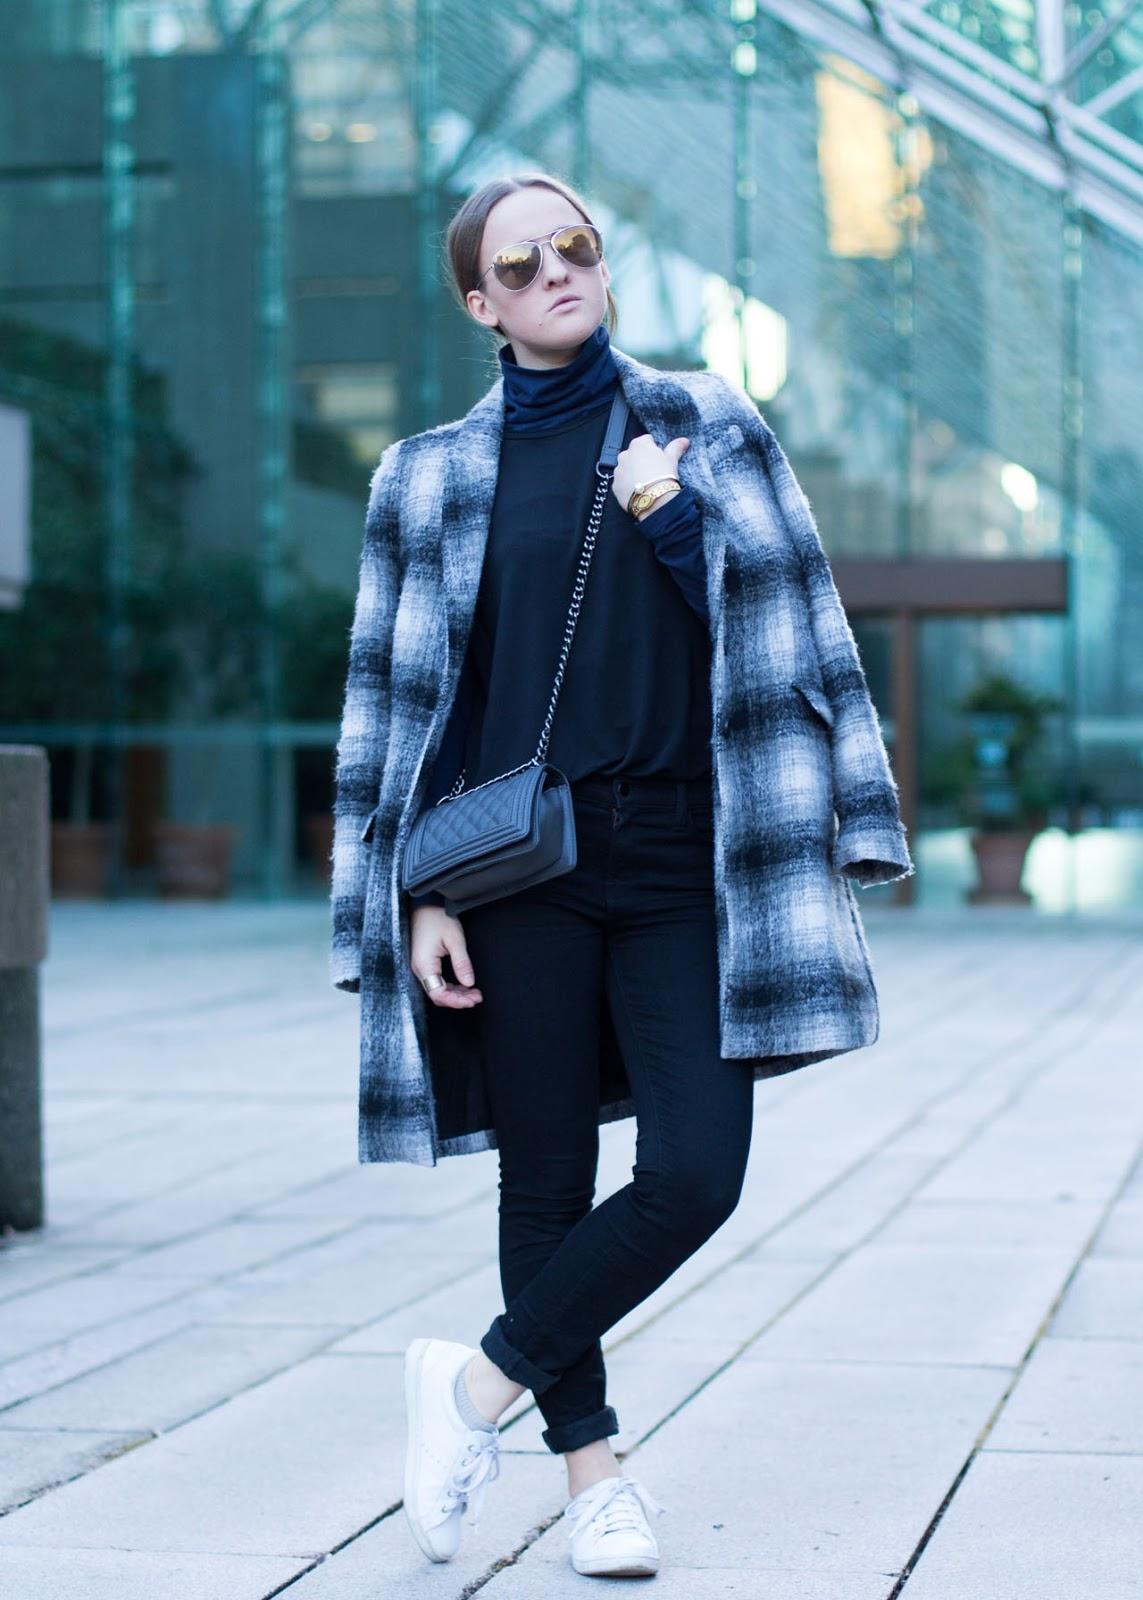 Winter turtleneck style - Canadian Fashion Blogger